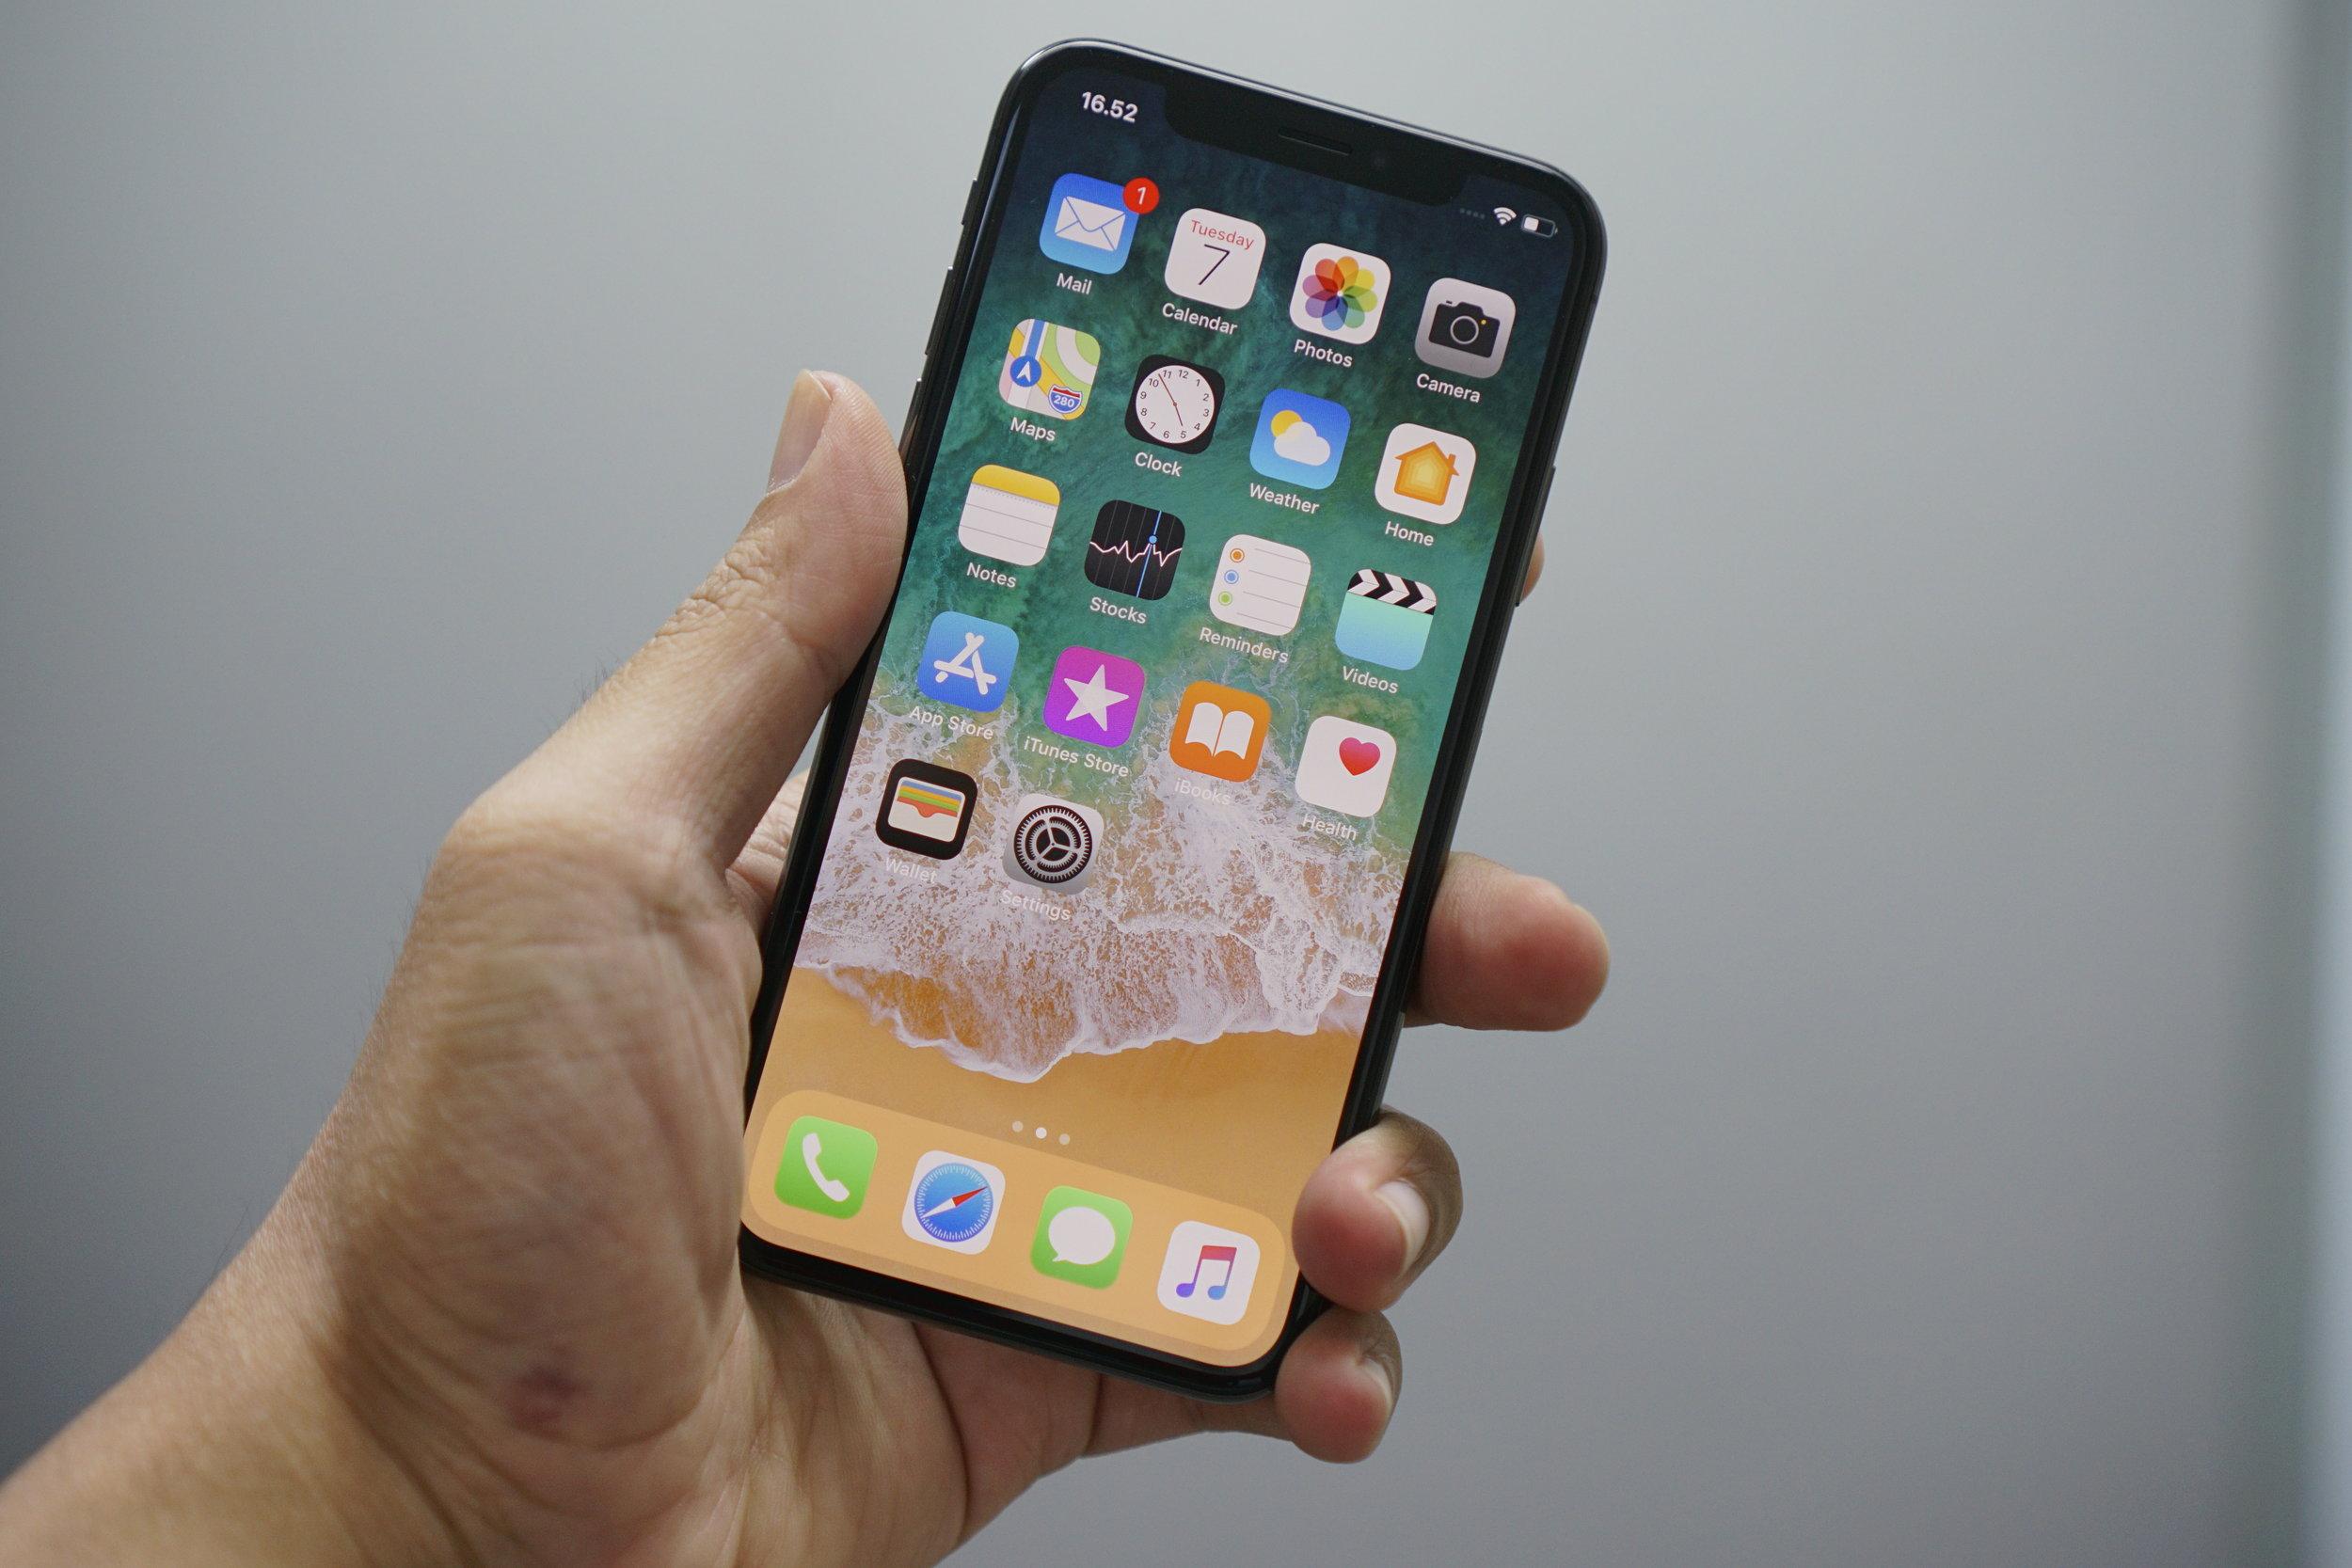 A man holding an Apple iPhone